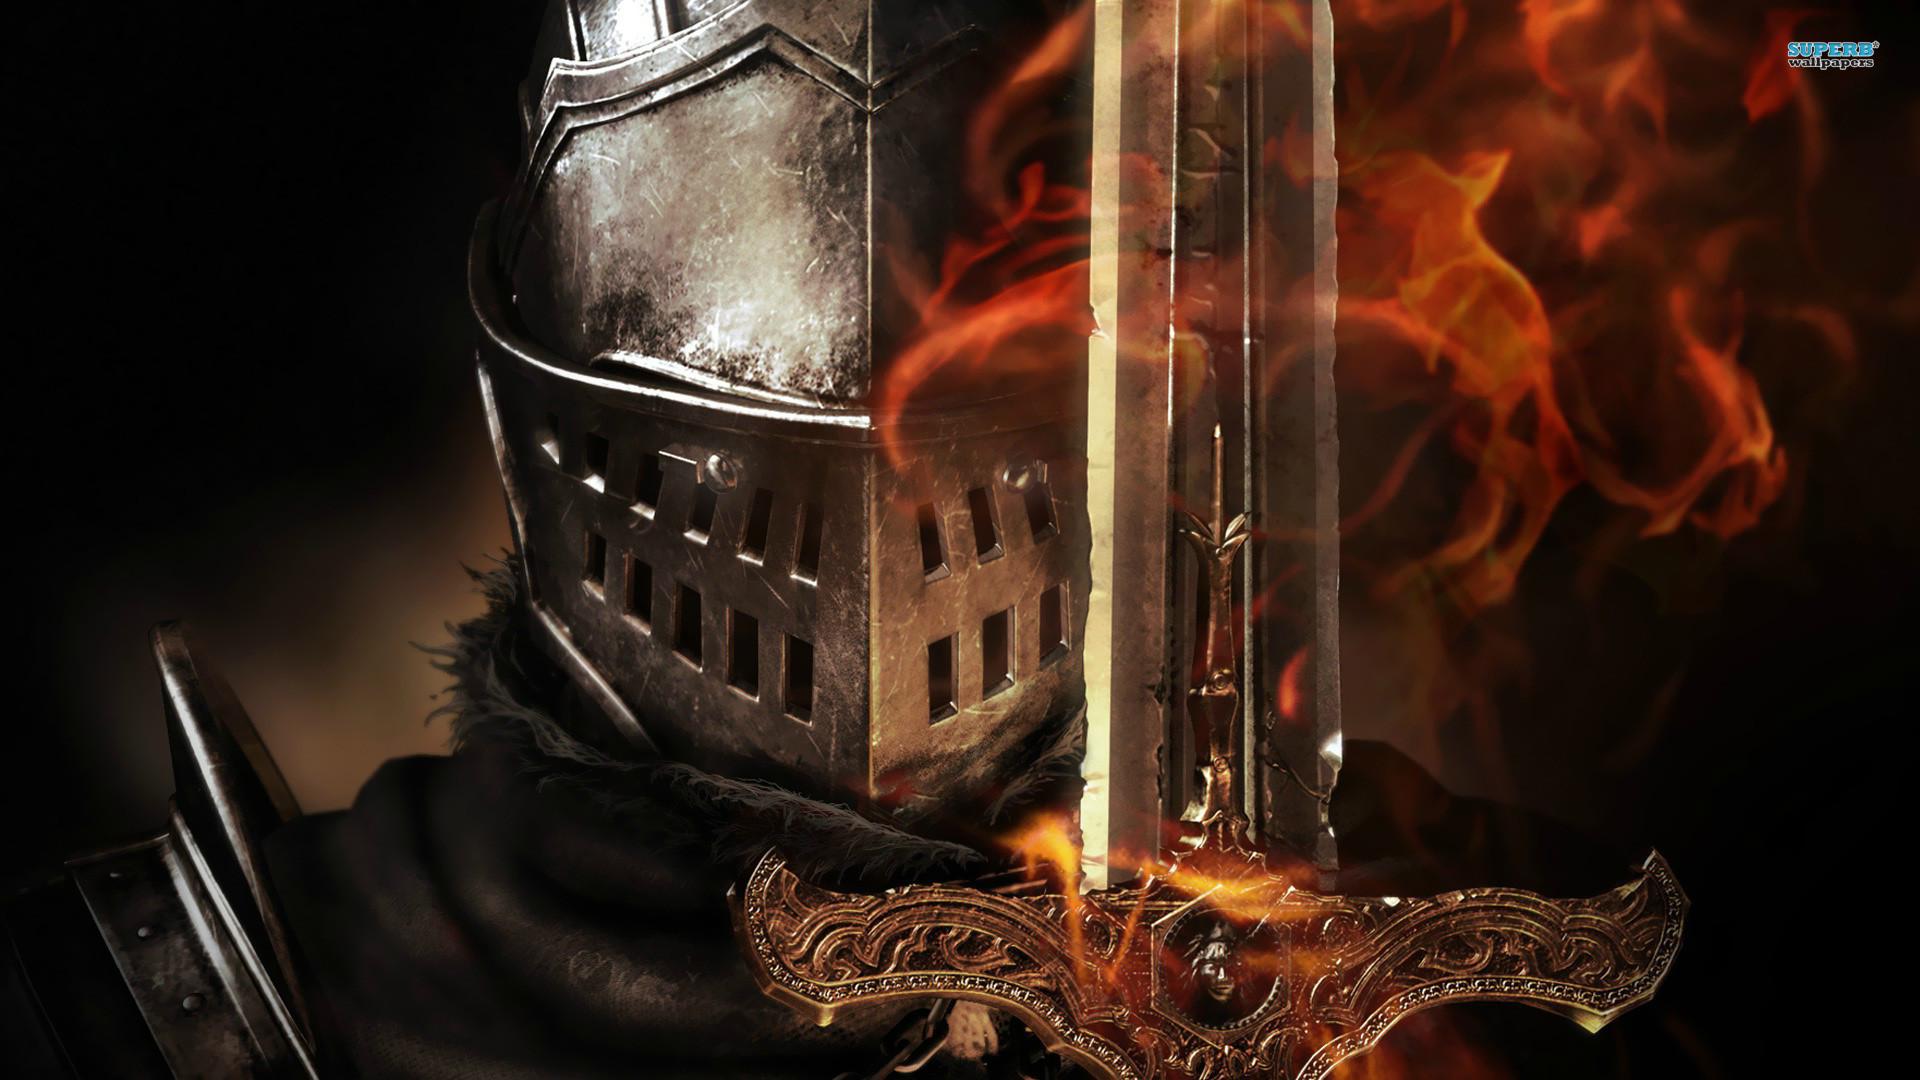 Dark Souls Pic. Dark Souls Wallpapers in Best px Resolutions